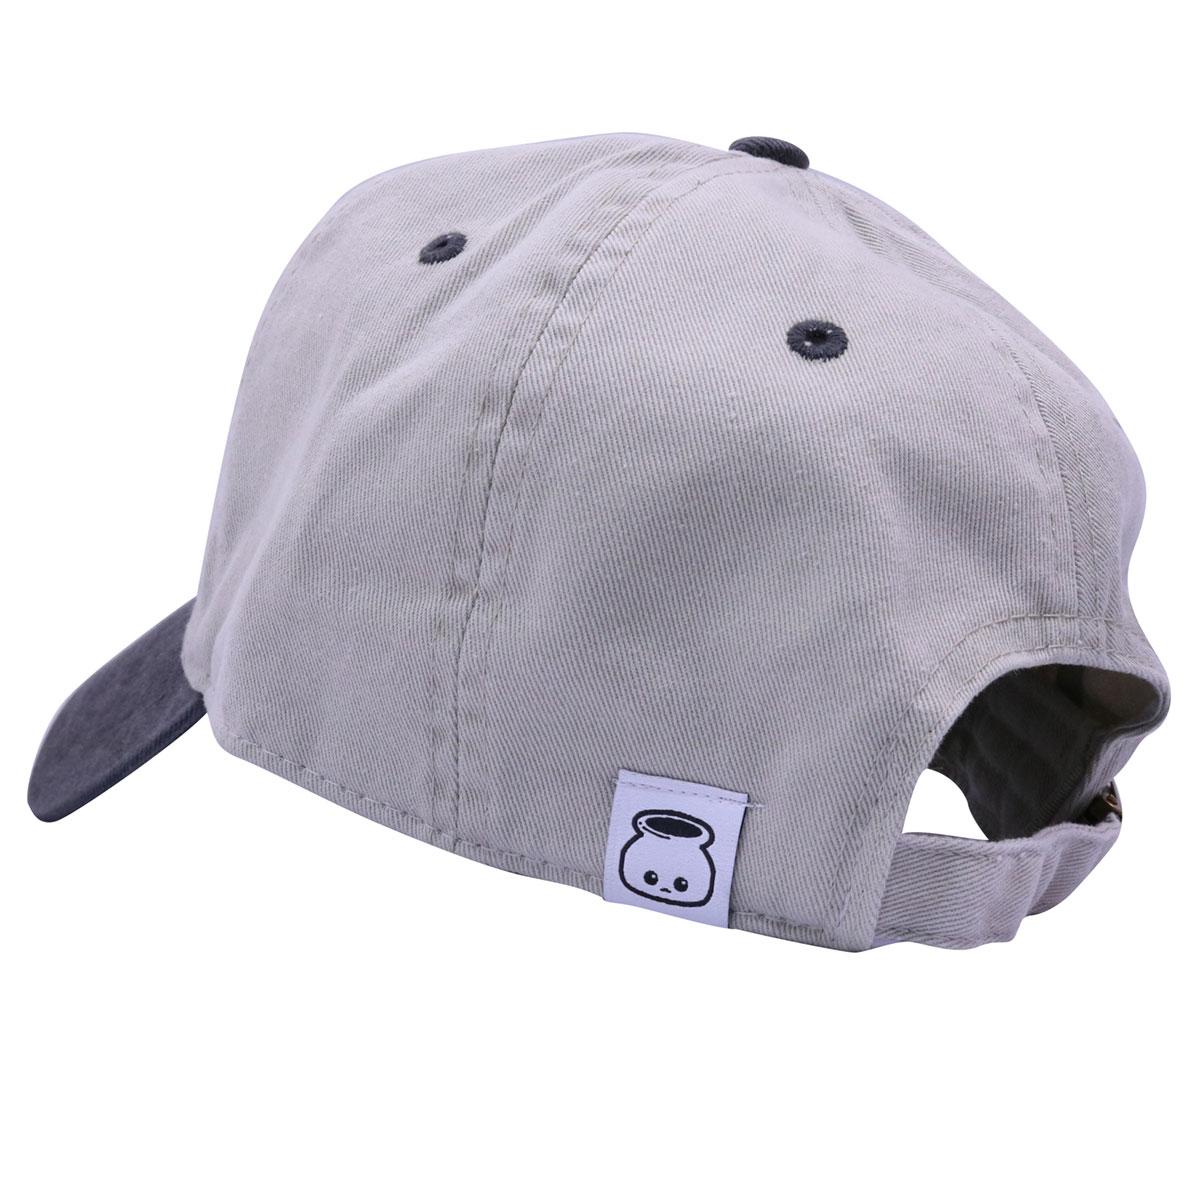 I CON Cap (Beige x Gray)